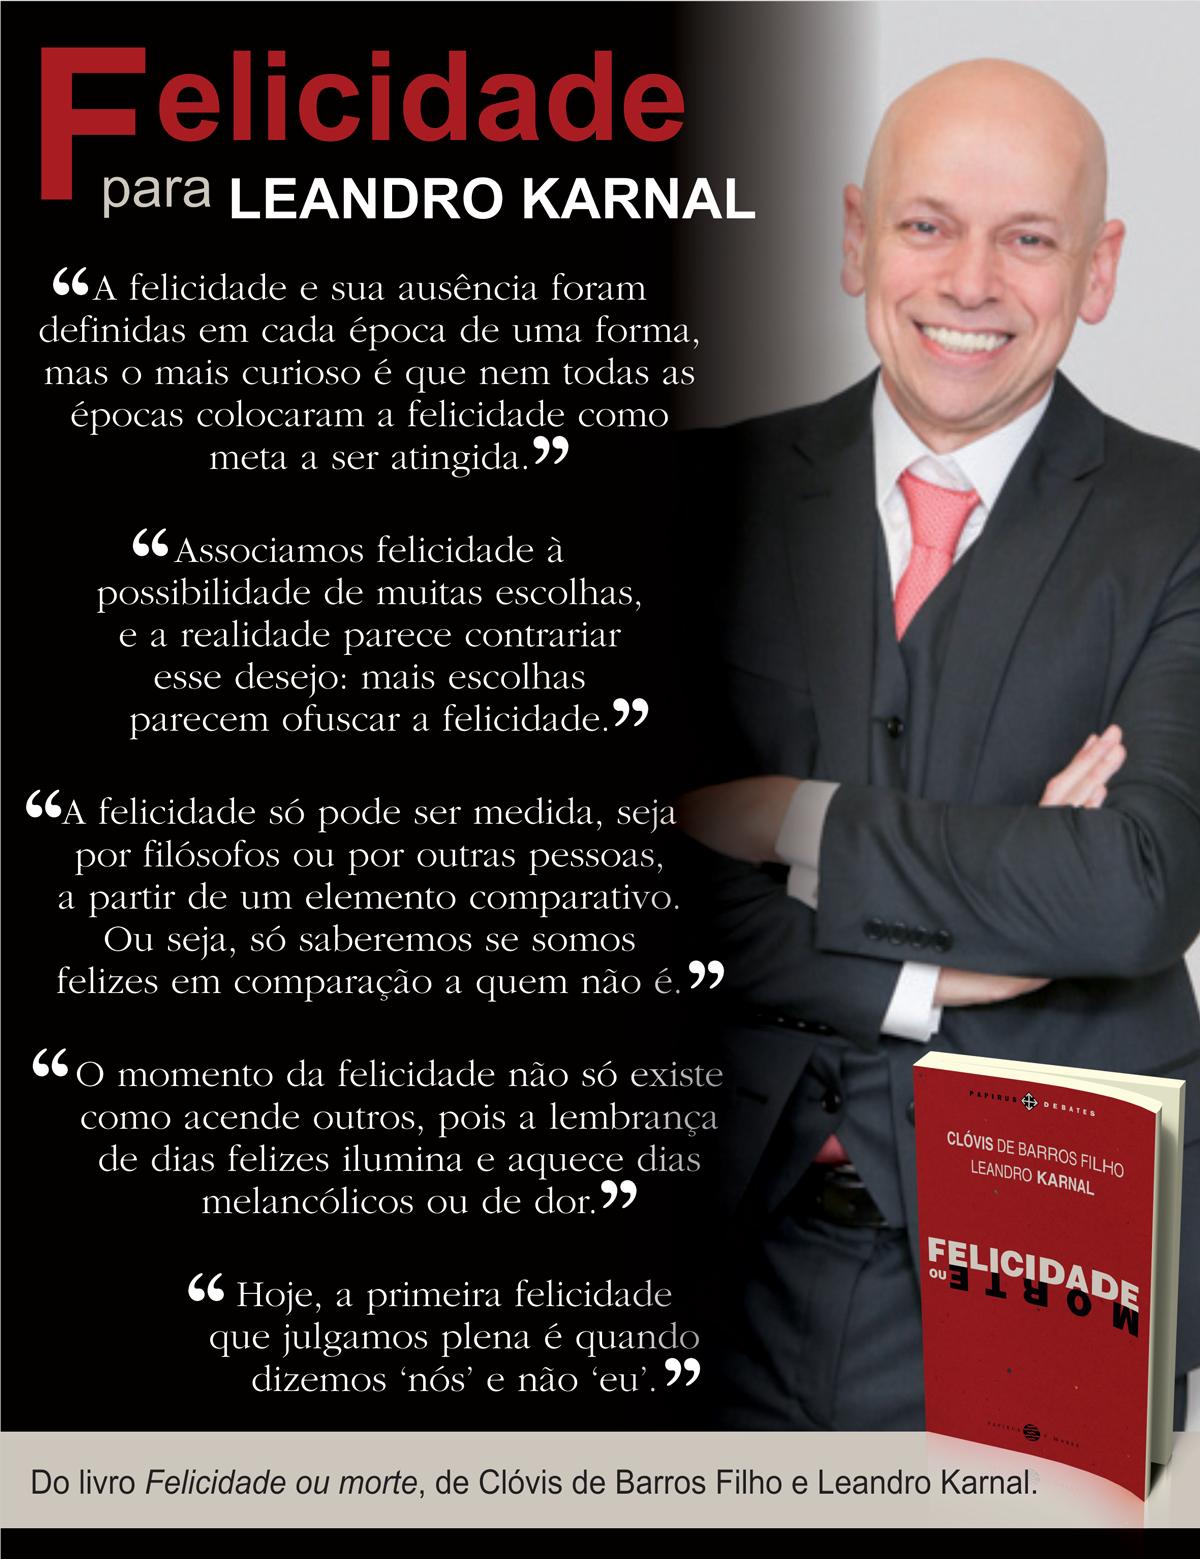 Felicidade Leandro Karnal Frases Citações 14ª Parte Pinterest